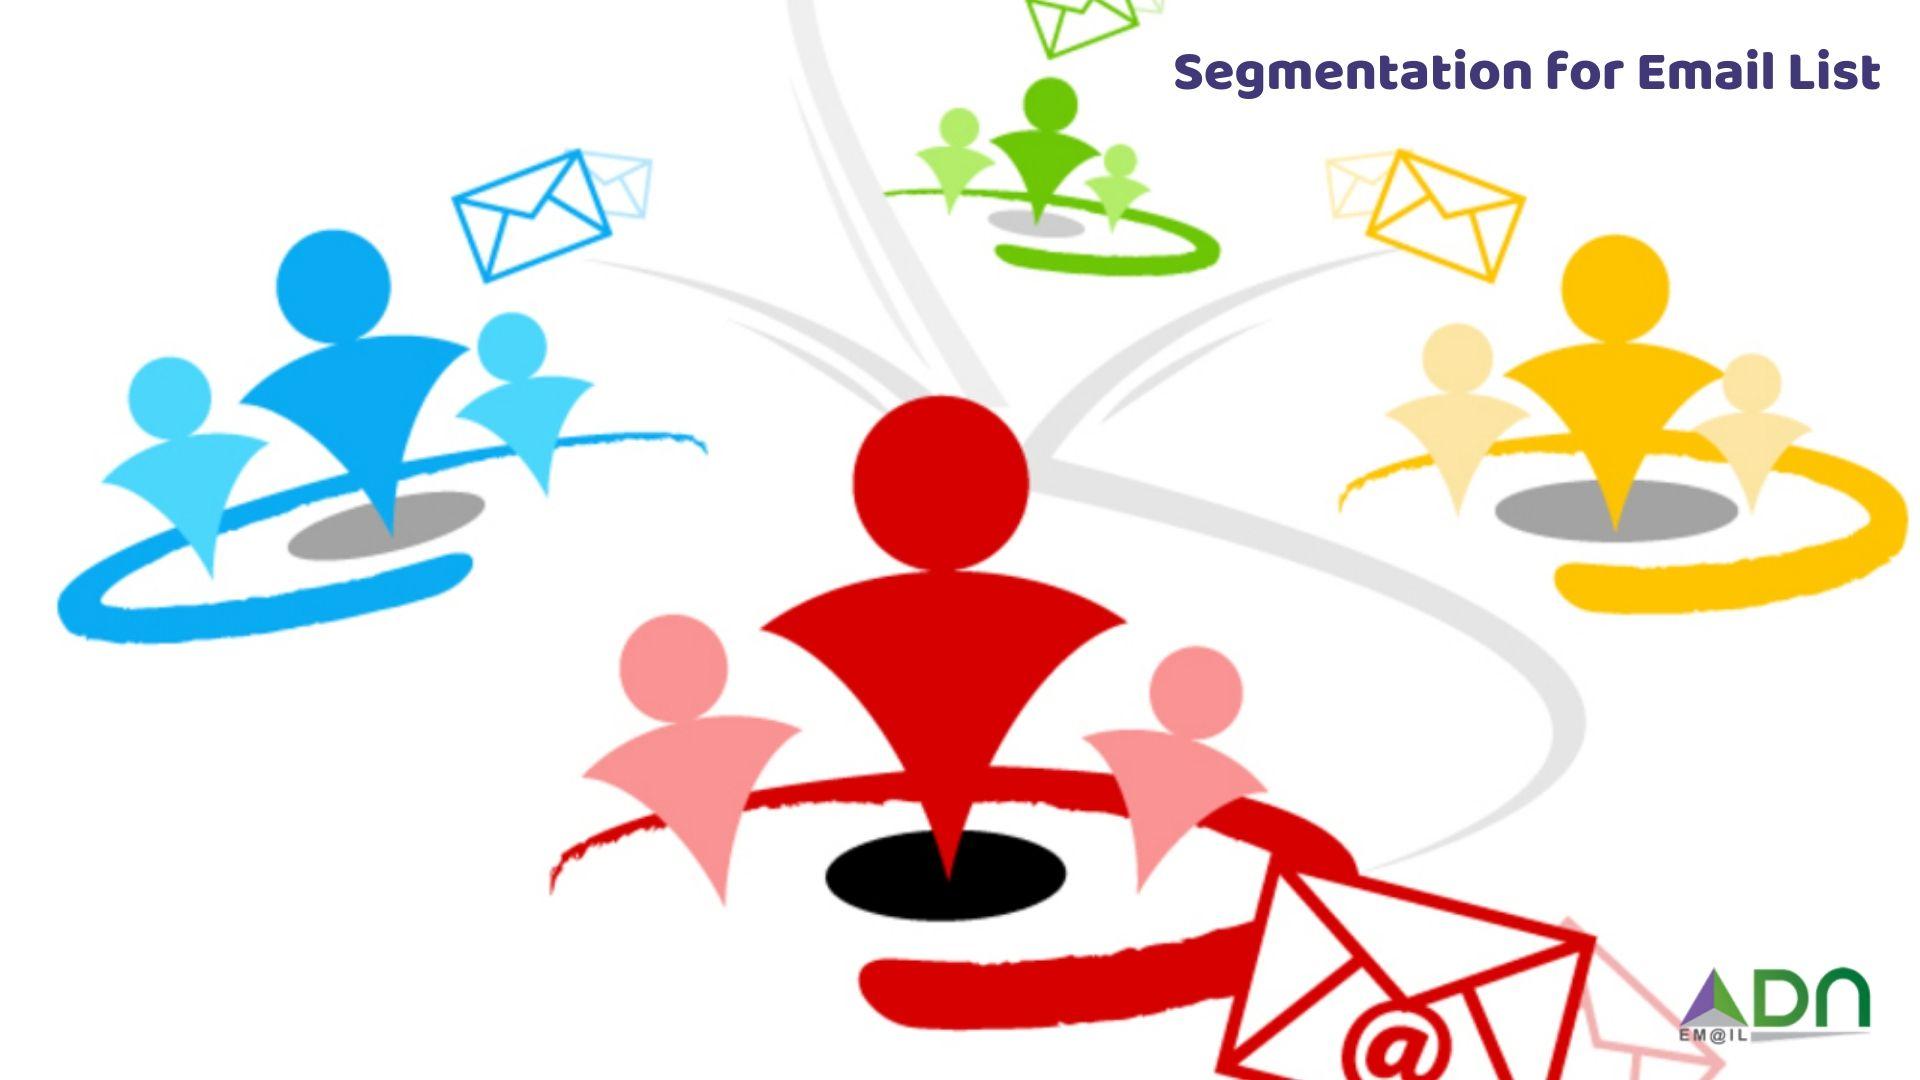 Segmentation for Email List